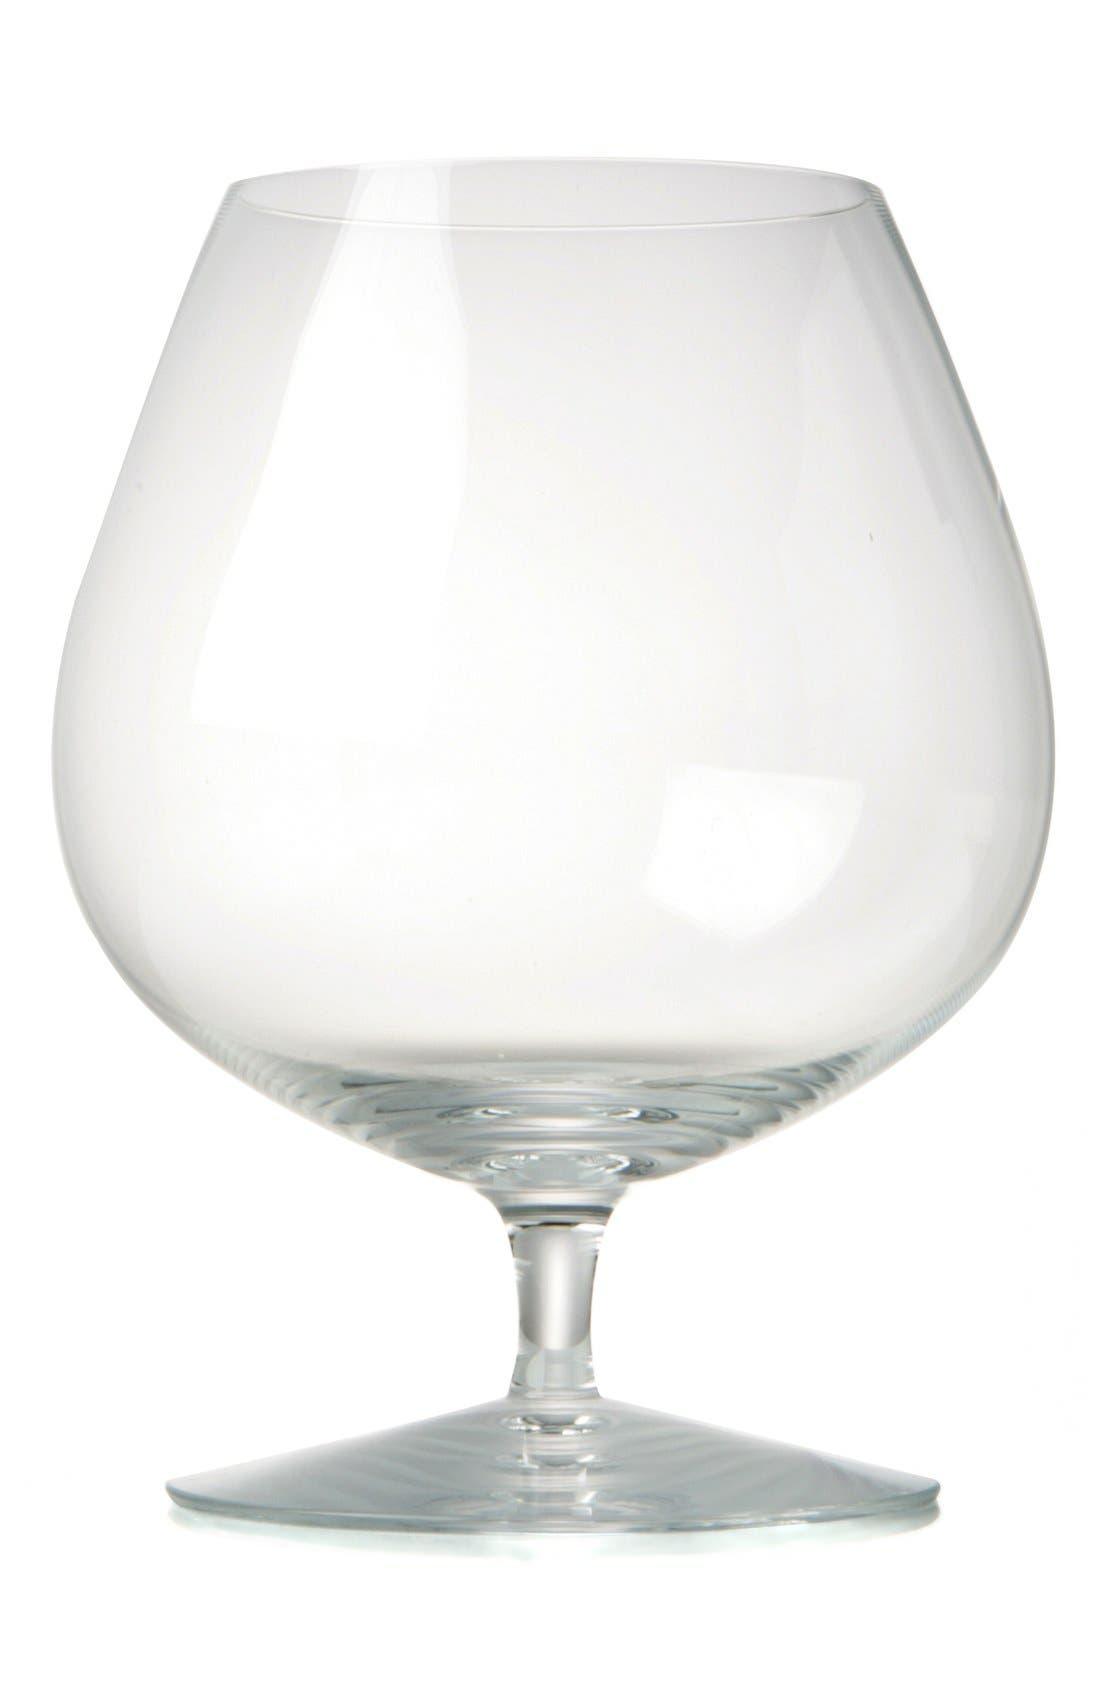 Alternate Image 1 Selected - Rogaska Crystal 'Expert' Cognac Glasses (Set of 2)